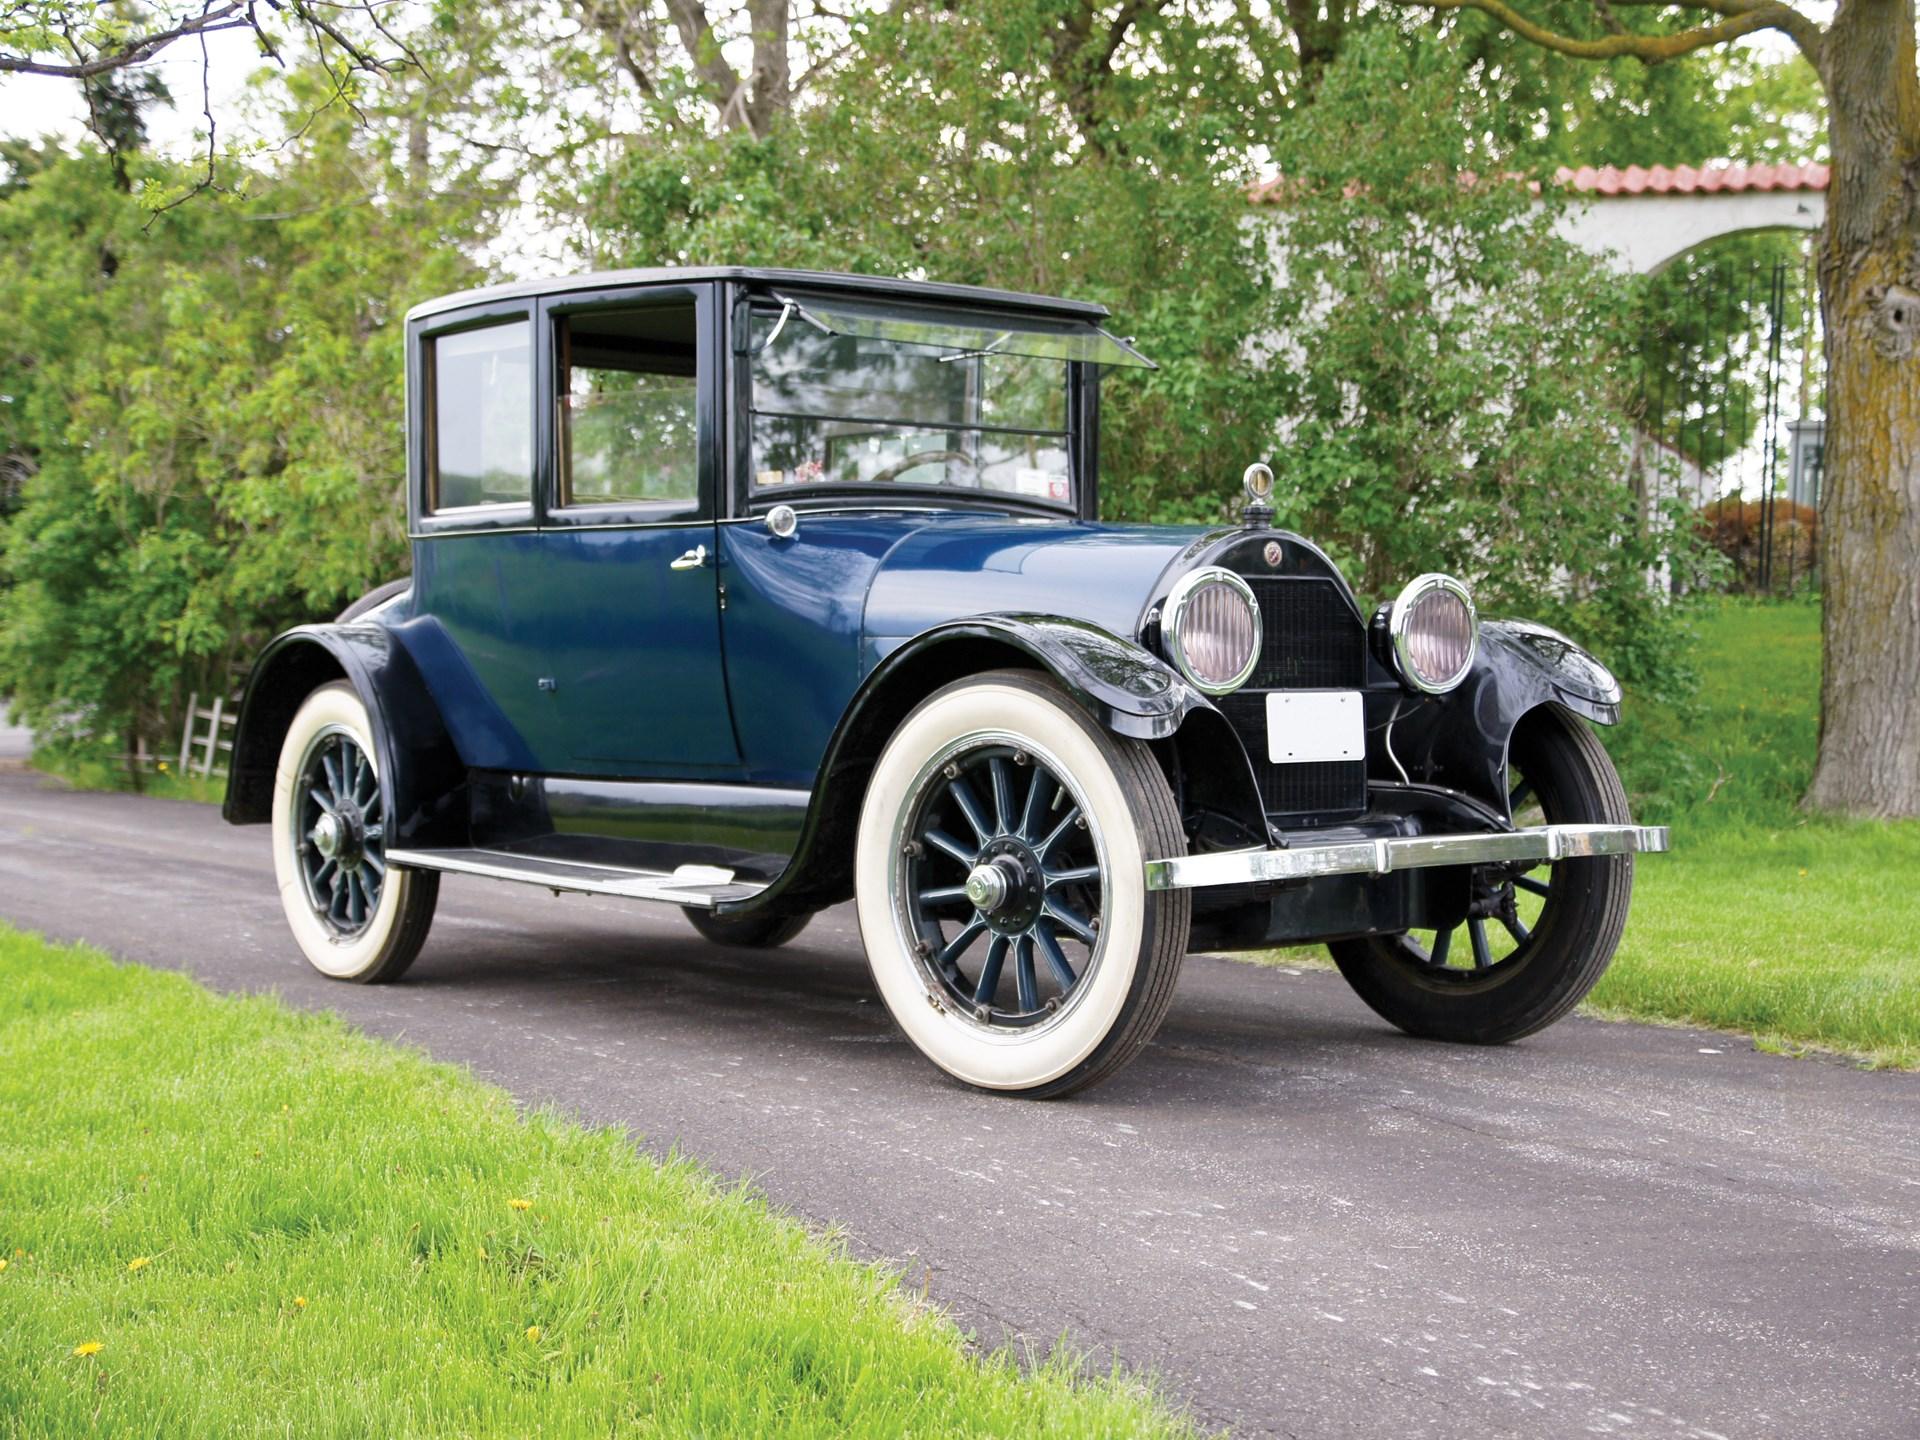 RM Sotheby's - 1920 Cadillac Model 59 Victoria   Motor City 2014